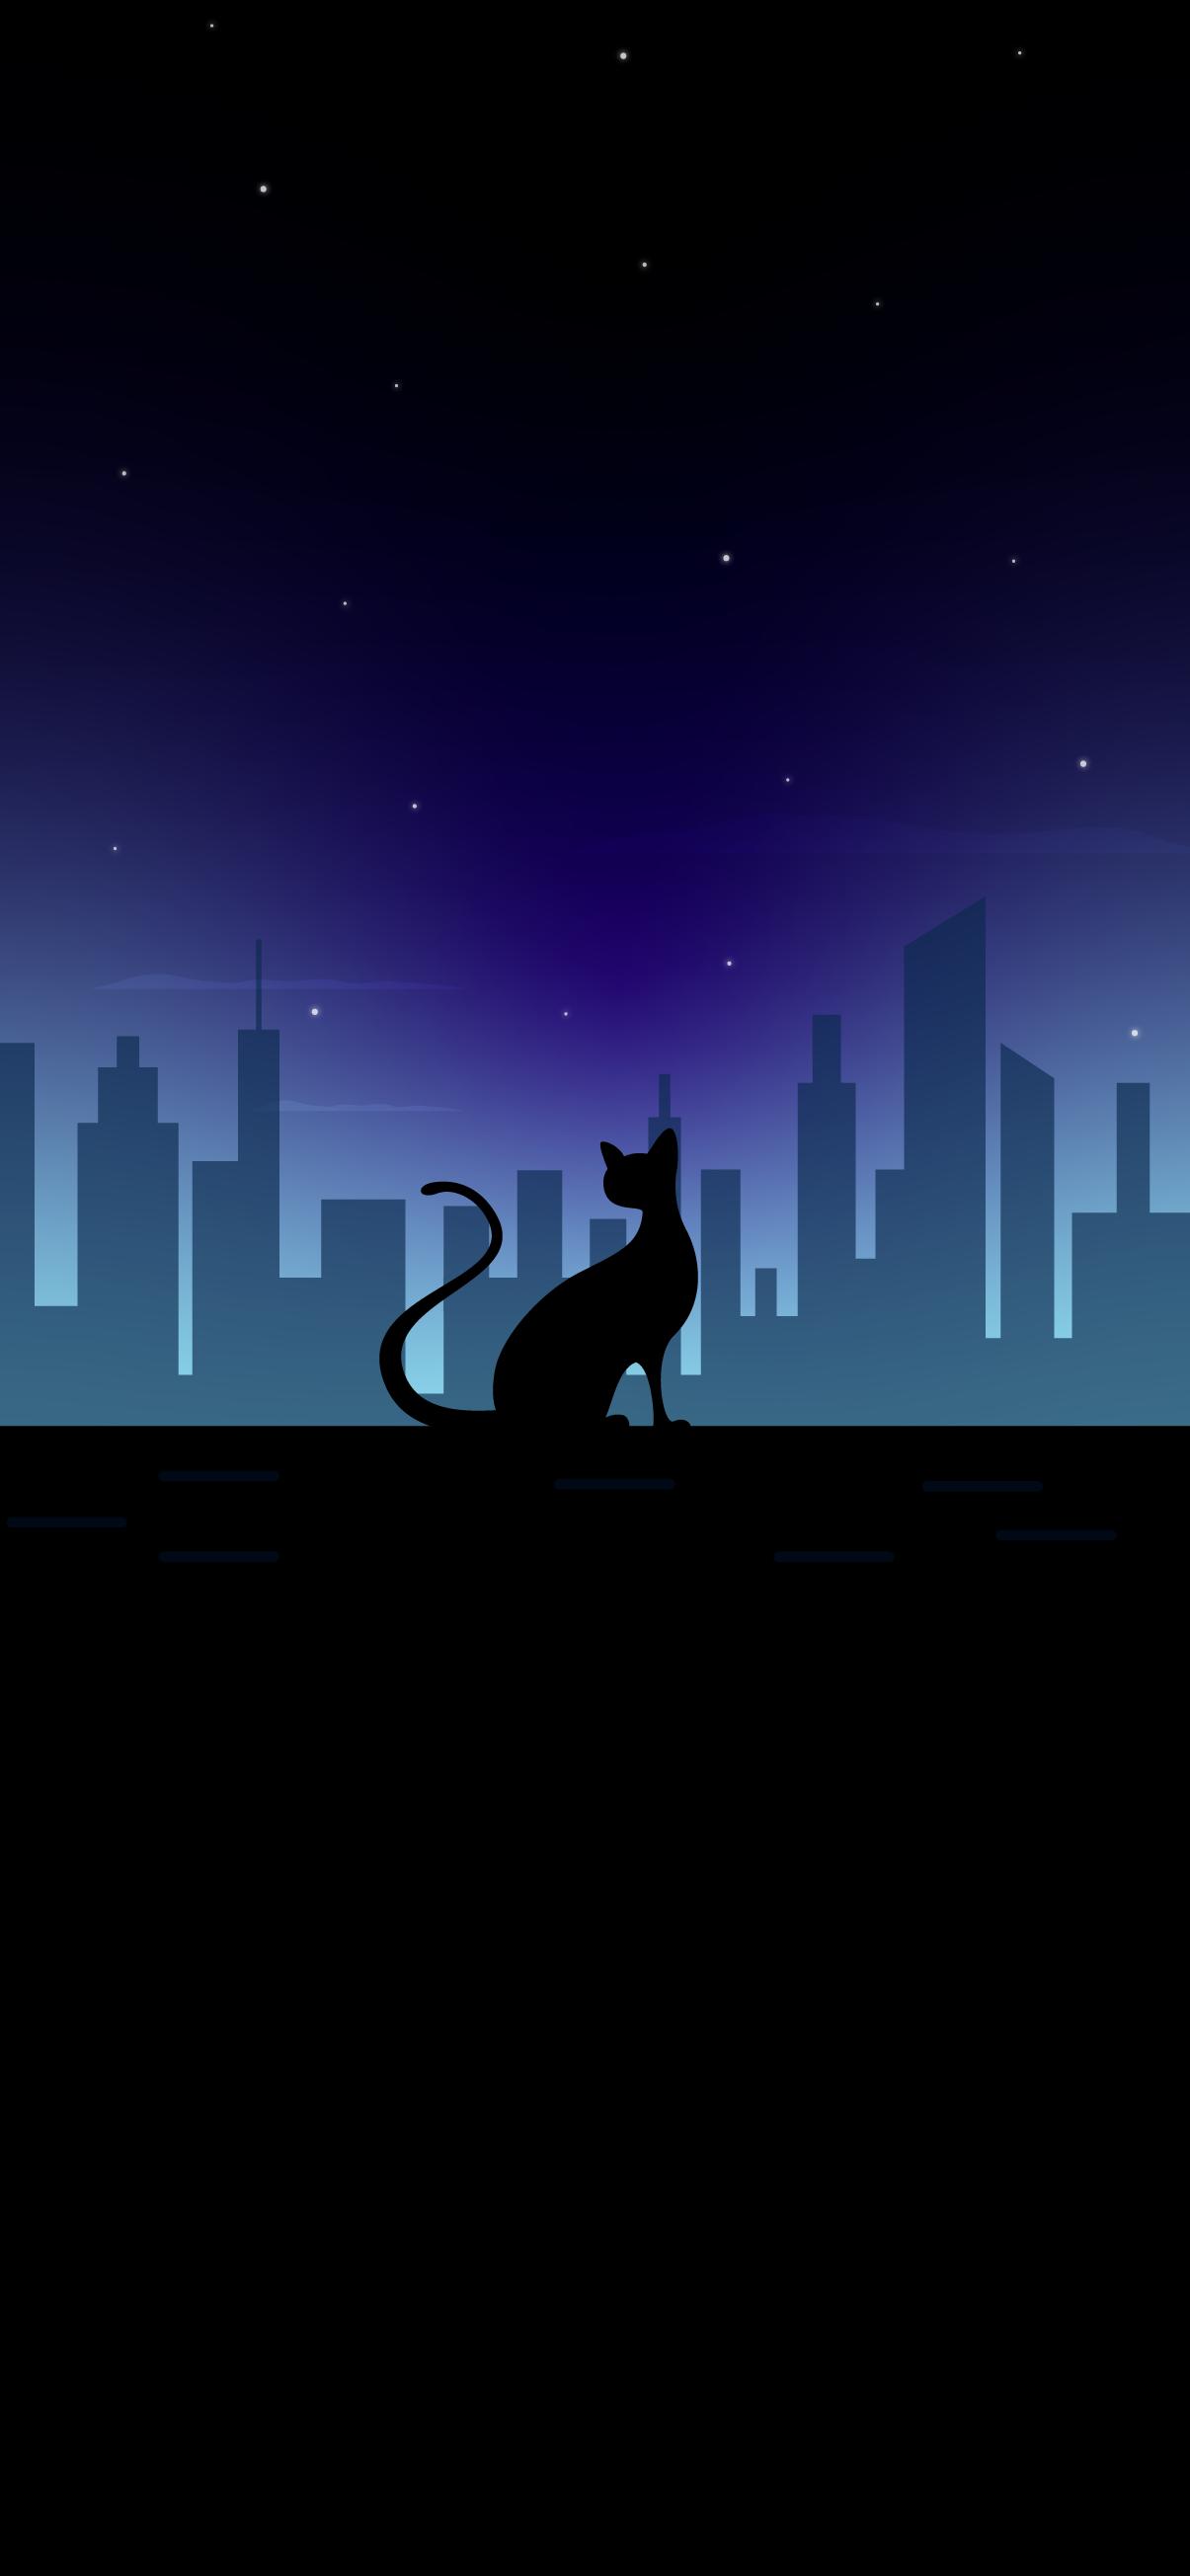 CAT  CITY BLACK AMOLED WALLPAPER 4K